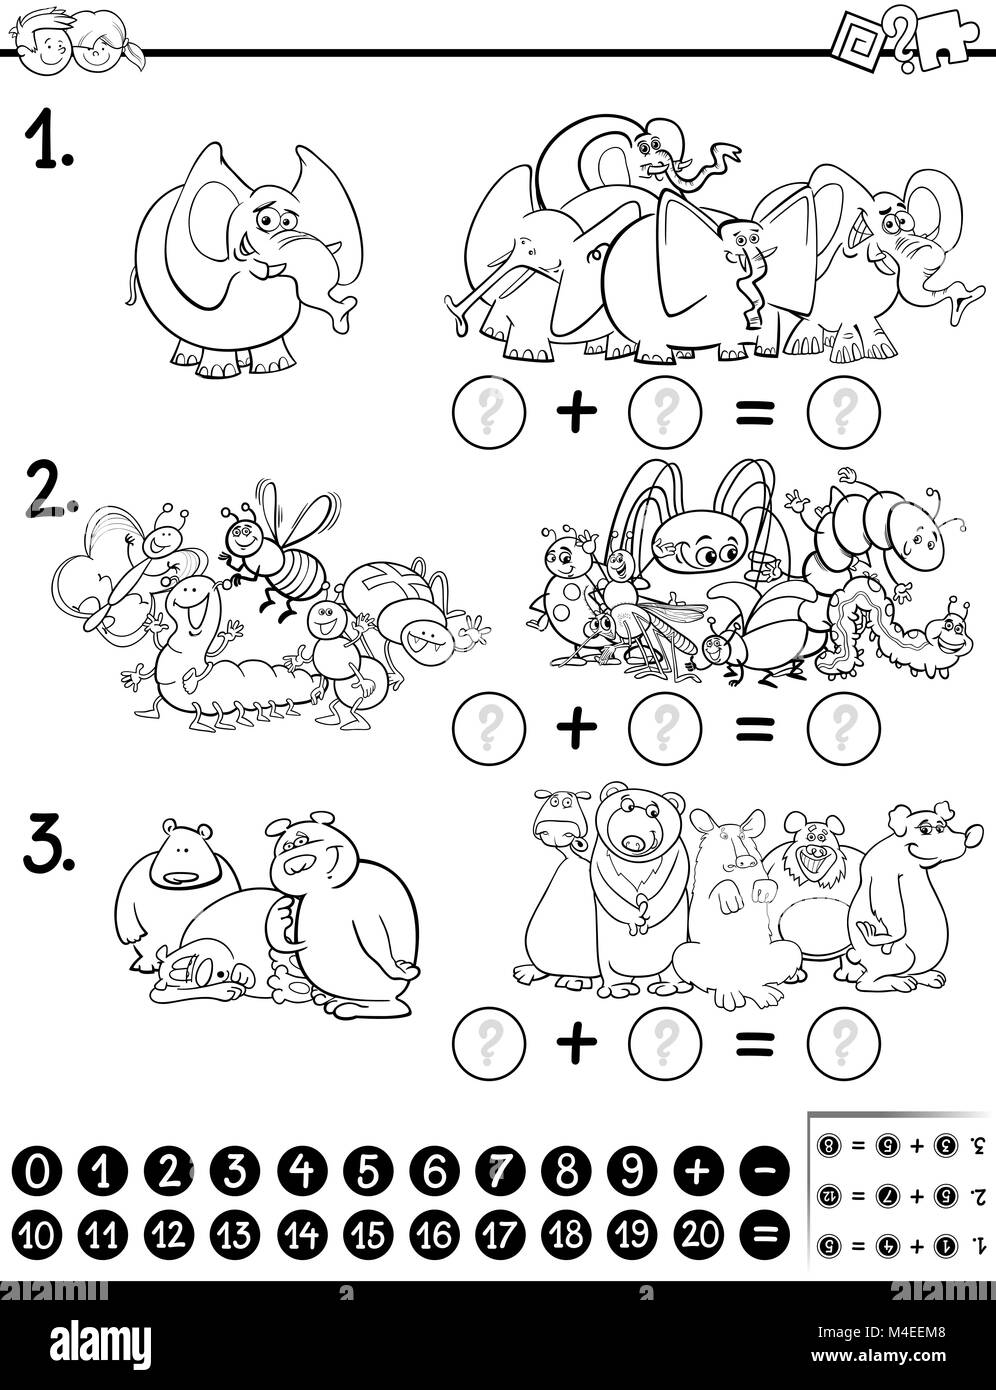 Maths Funny Stockfotos & Maths Funny Bilder - Seite 2 - Alamy